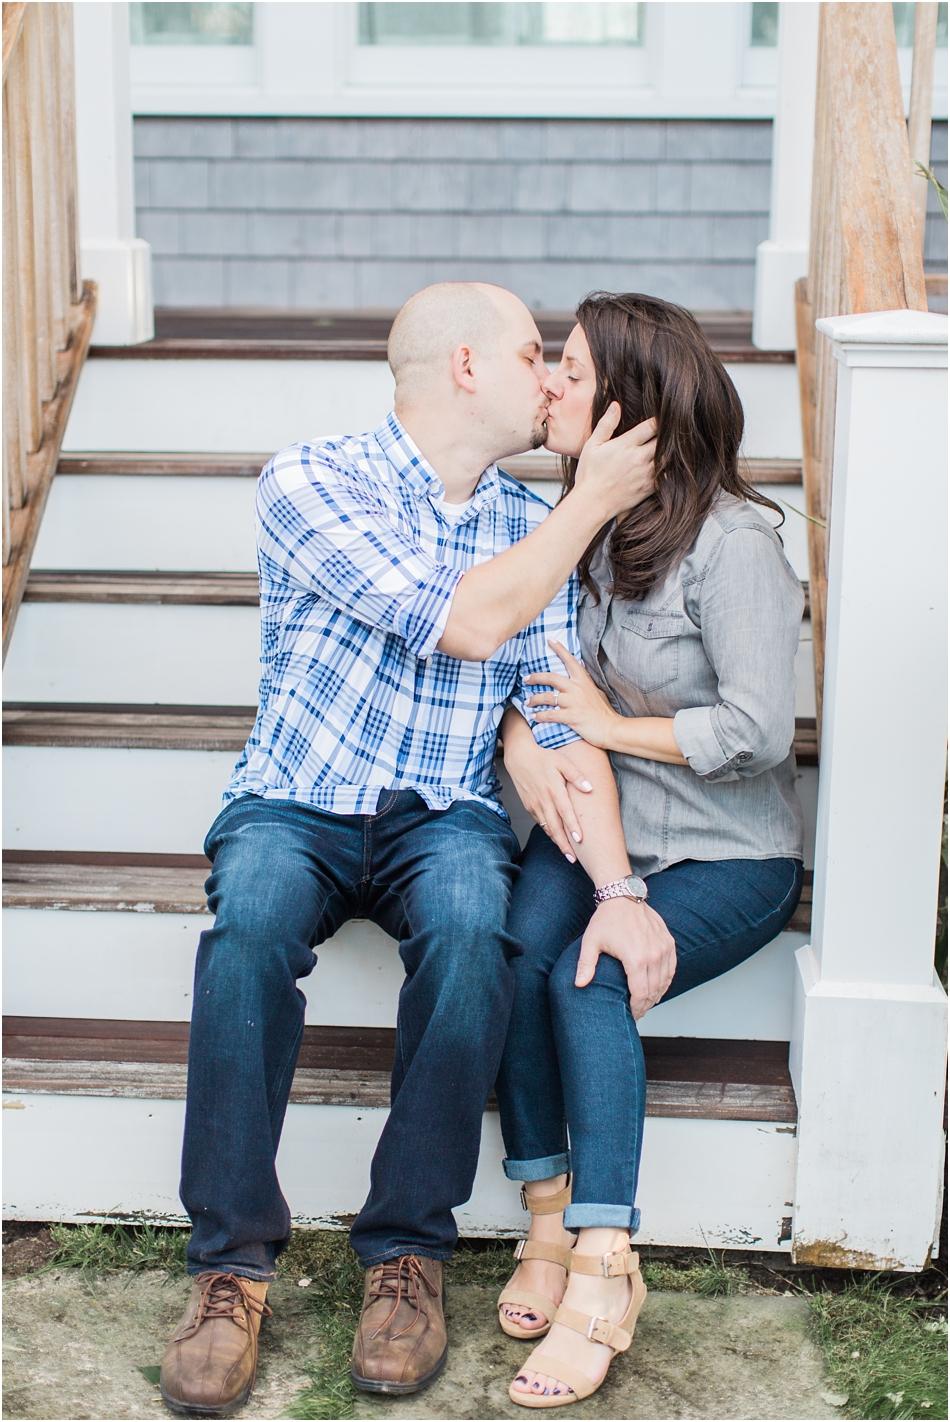 chatham_engagement_danielle_luke_cape_cod_boston_new_england_wedding_photographer_Meredith_Jane_Photography_photo_2621.jpg